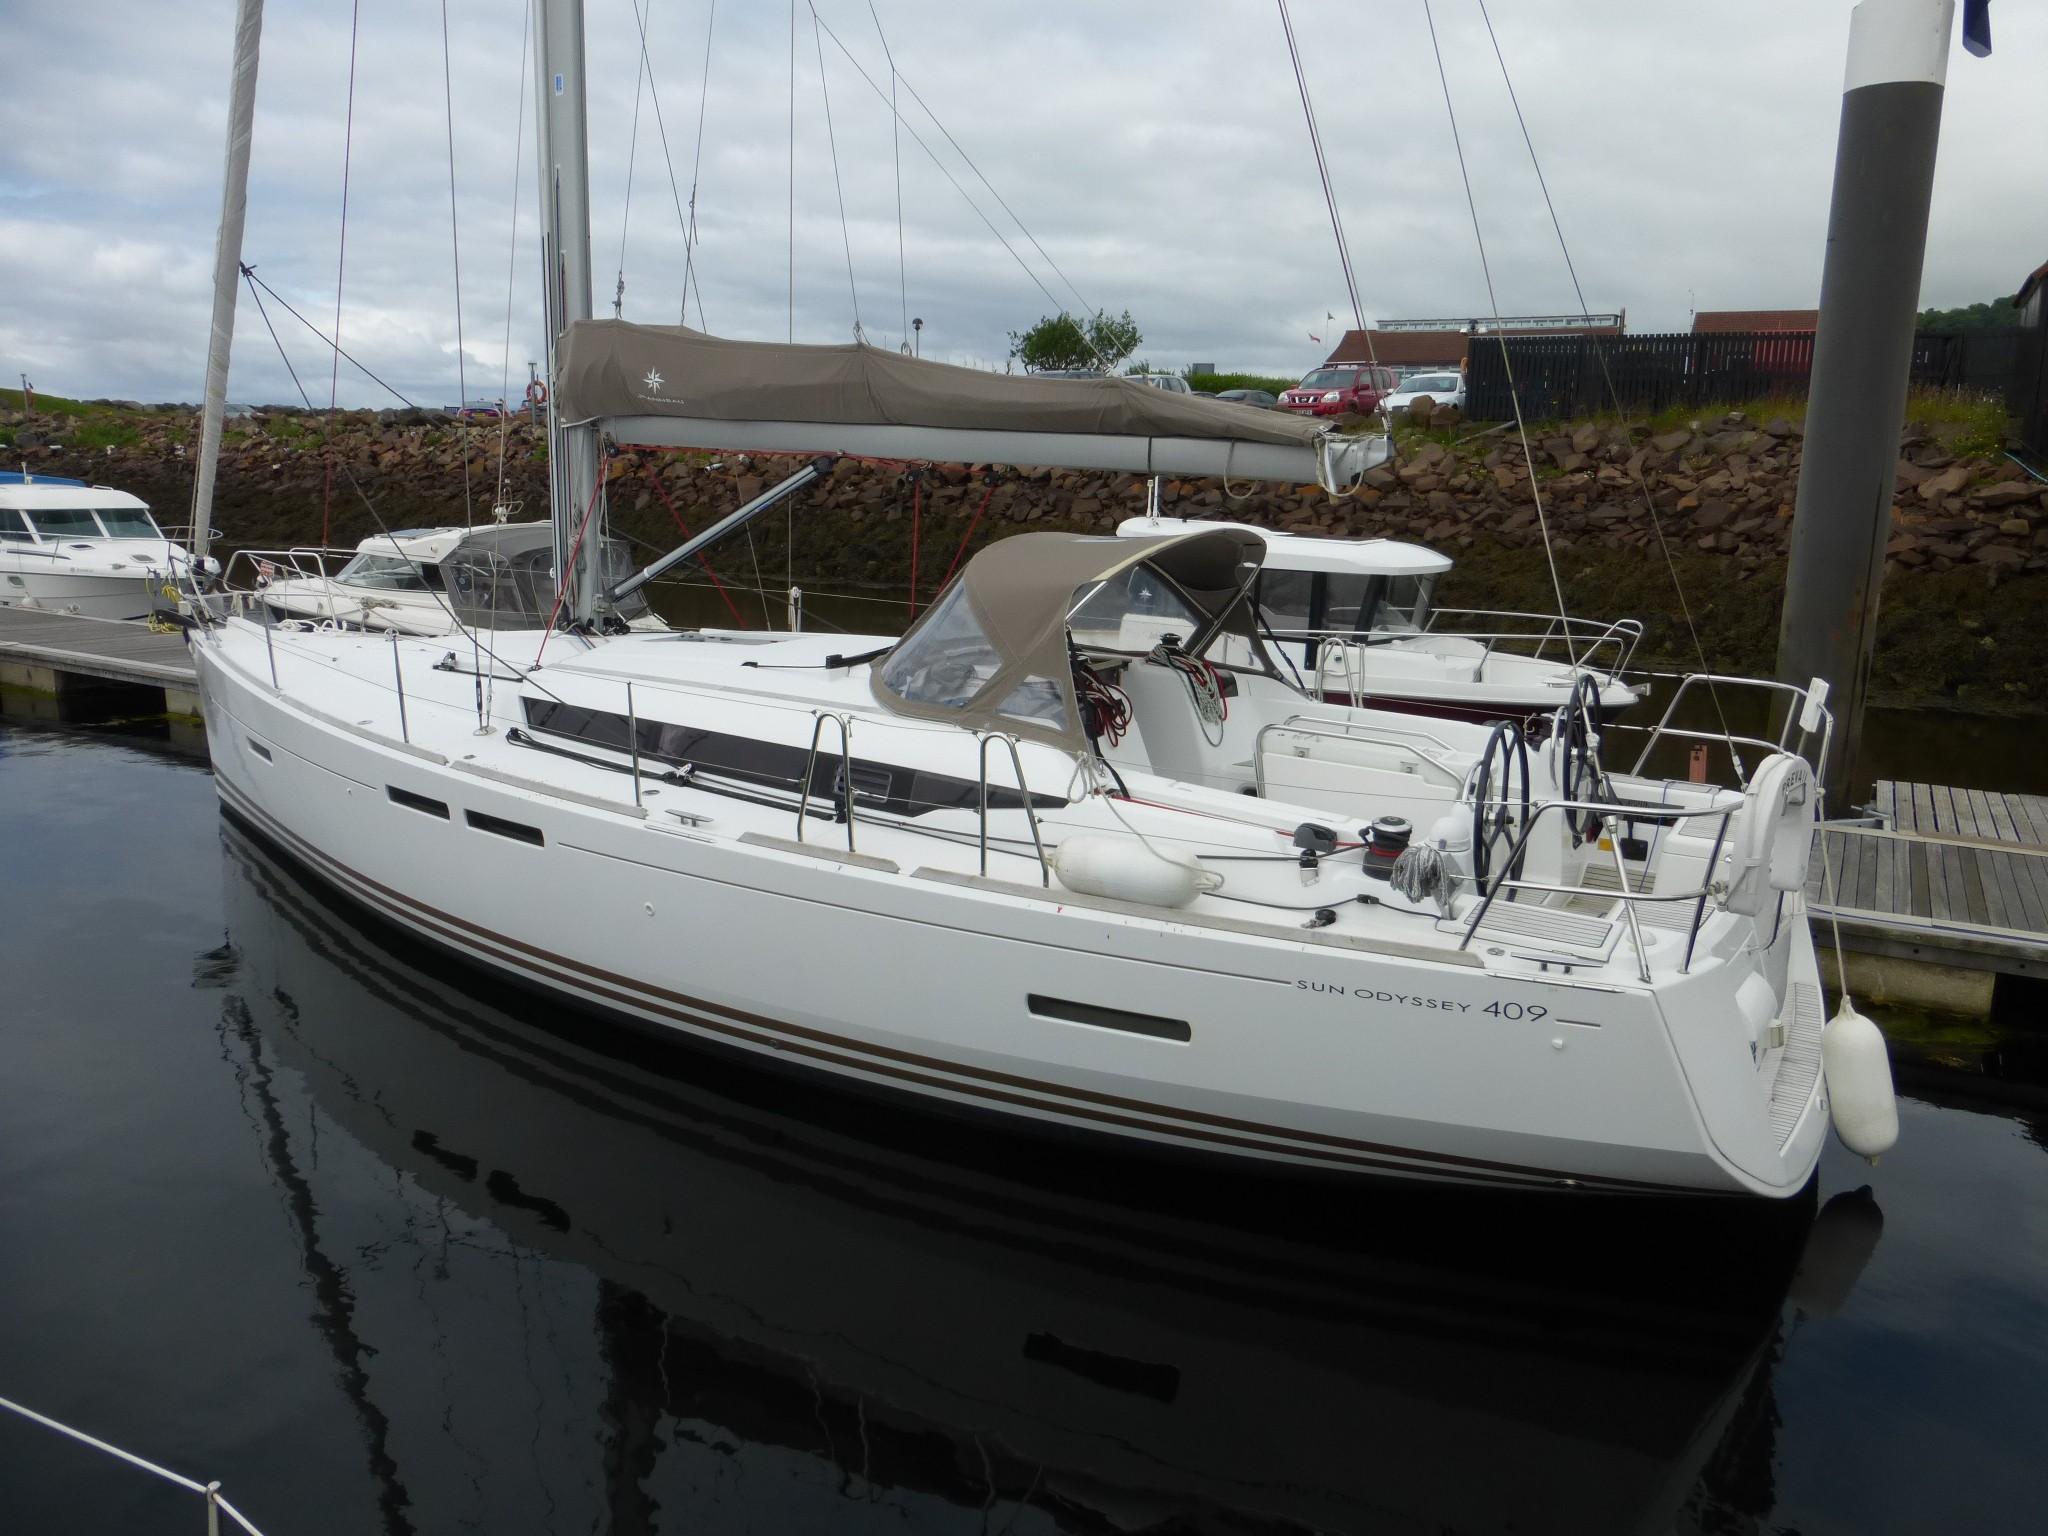 Euroyachts – Since 1965